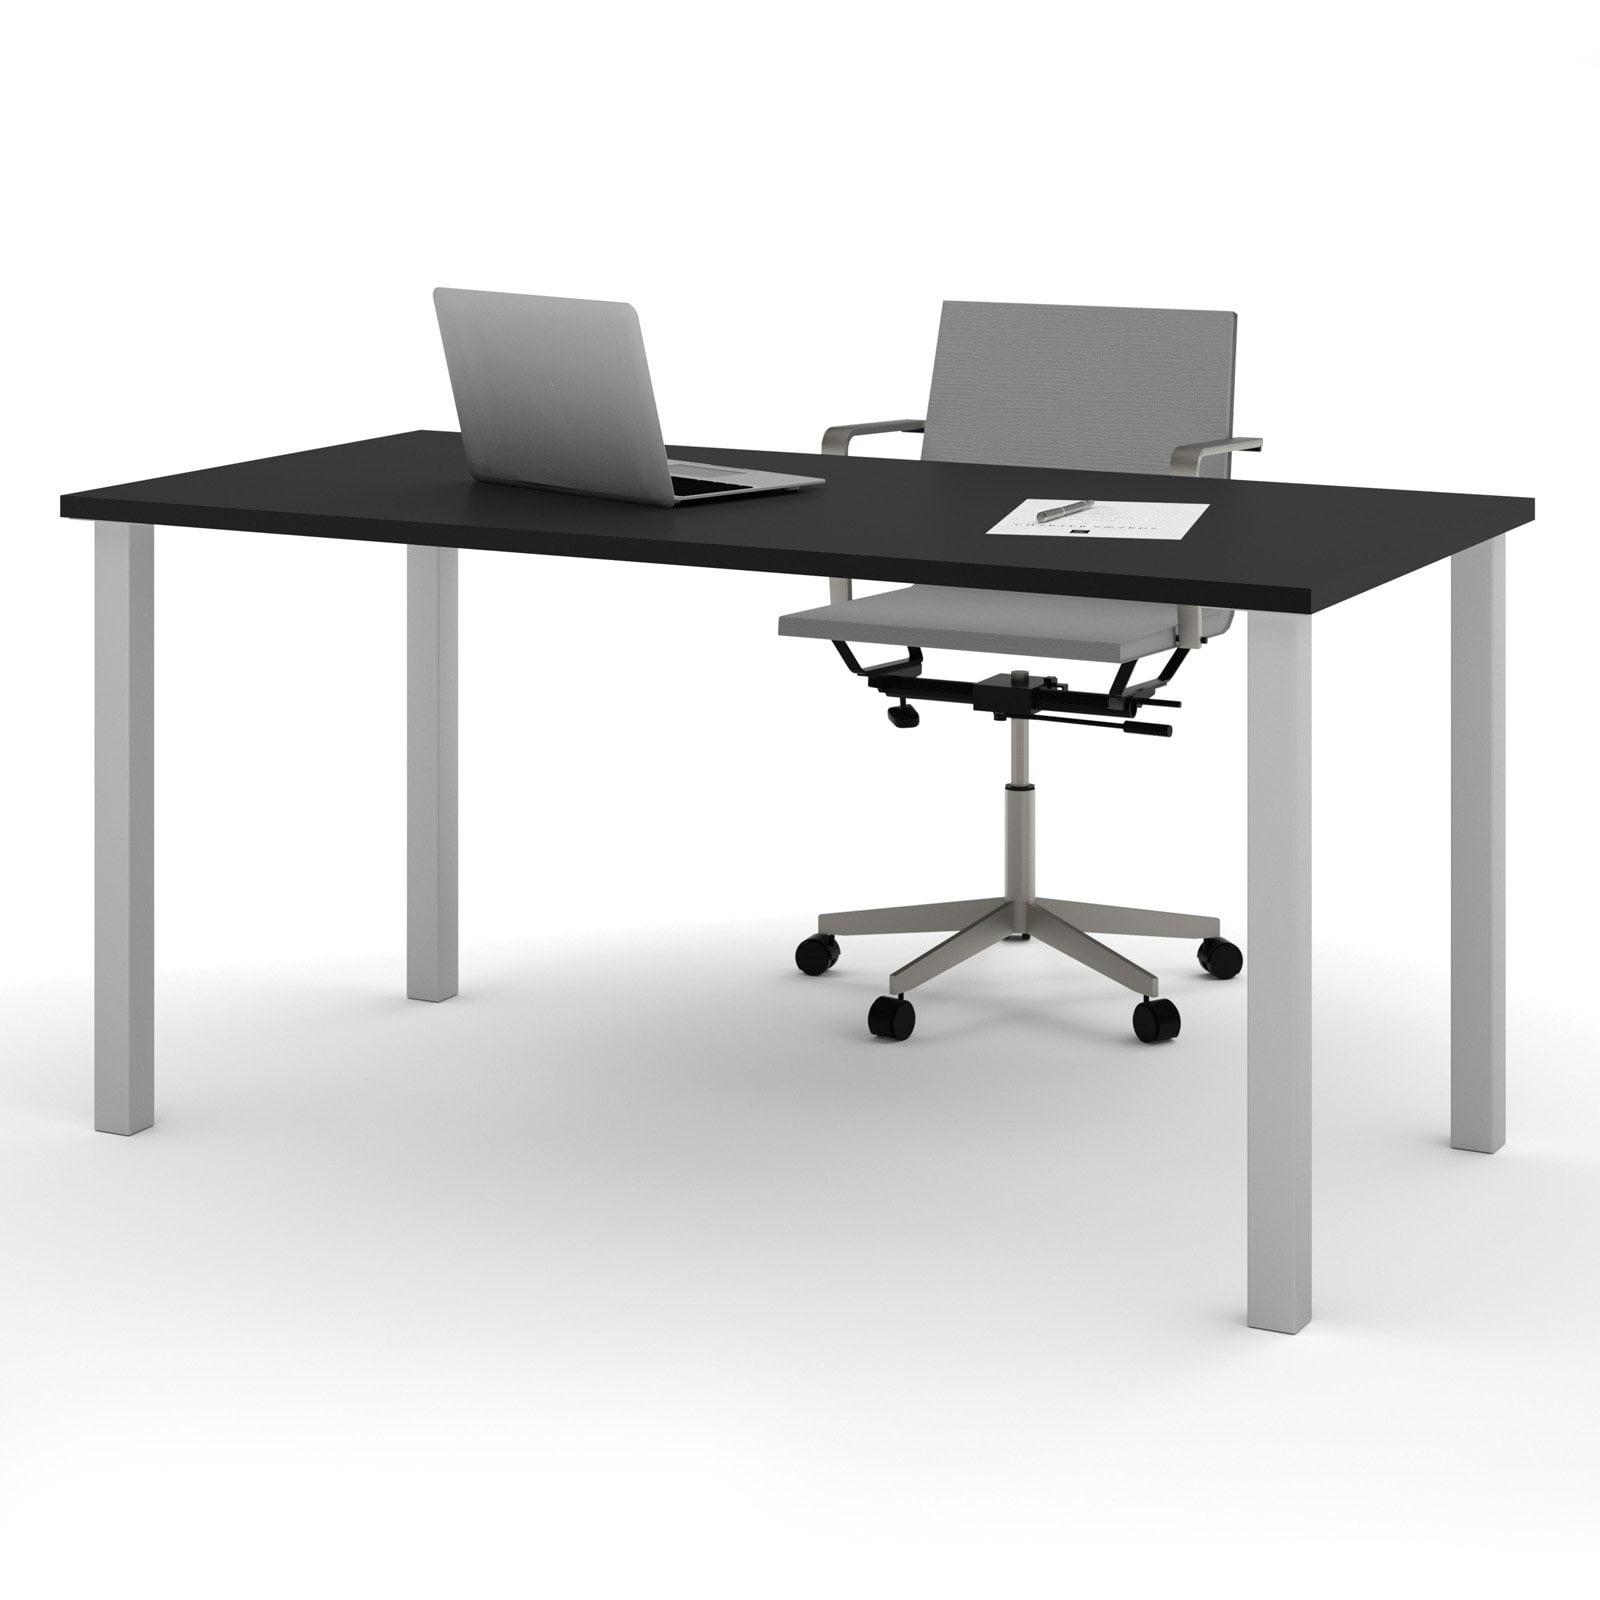 "Bestar 30"" x 60"" Table with square metal legs in Black by Bestar"